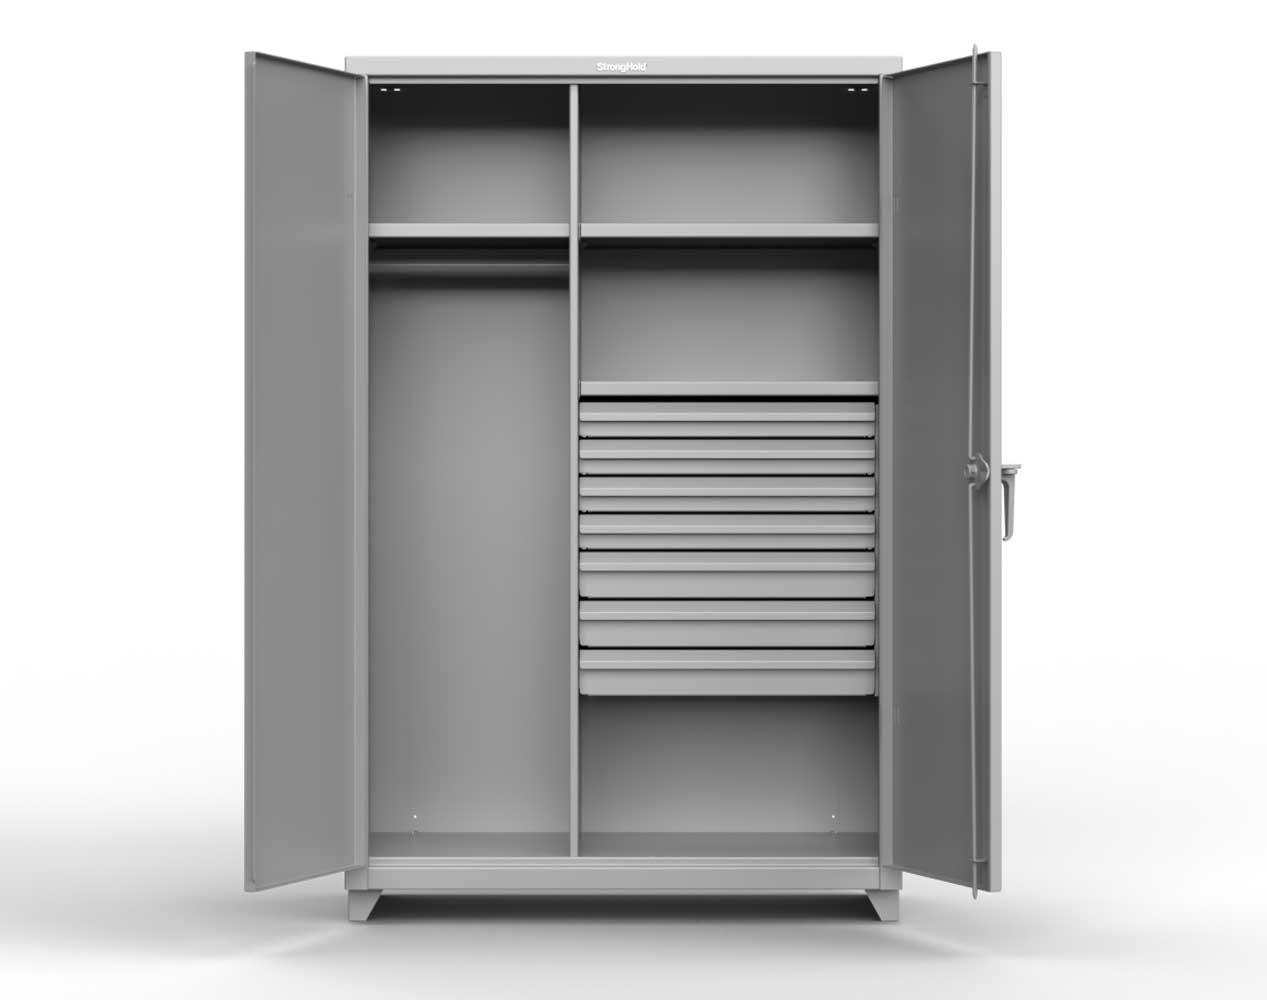 Heavy Duty 14 GA Wardrobe Cabinet with 7 Drawers, 3 Shelves – 36 In. W x 24 In. D x 75 In. H